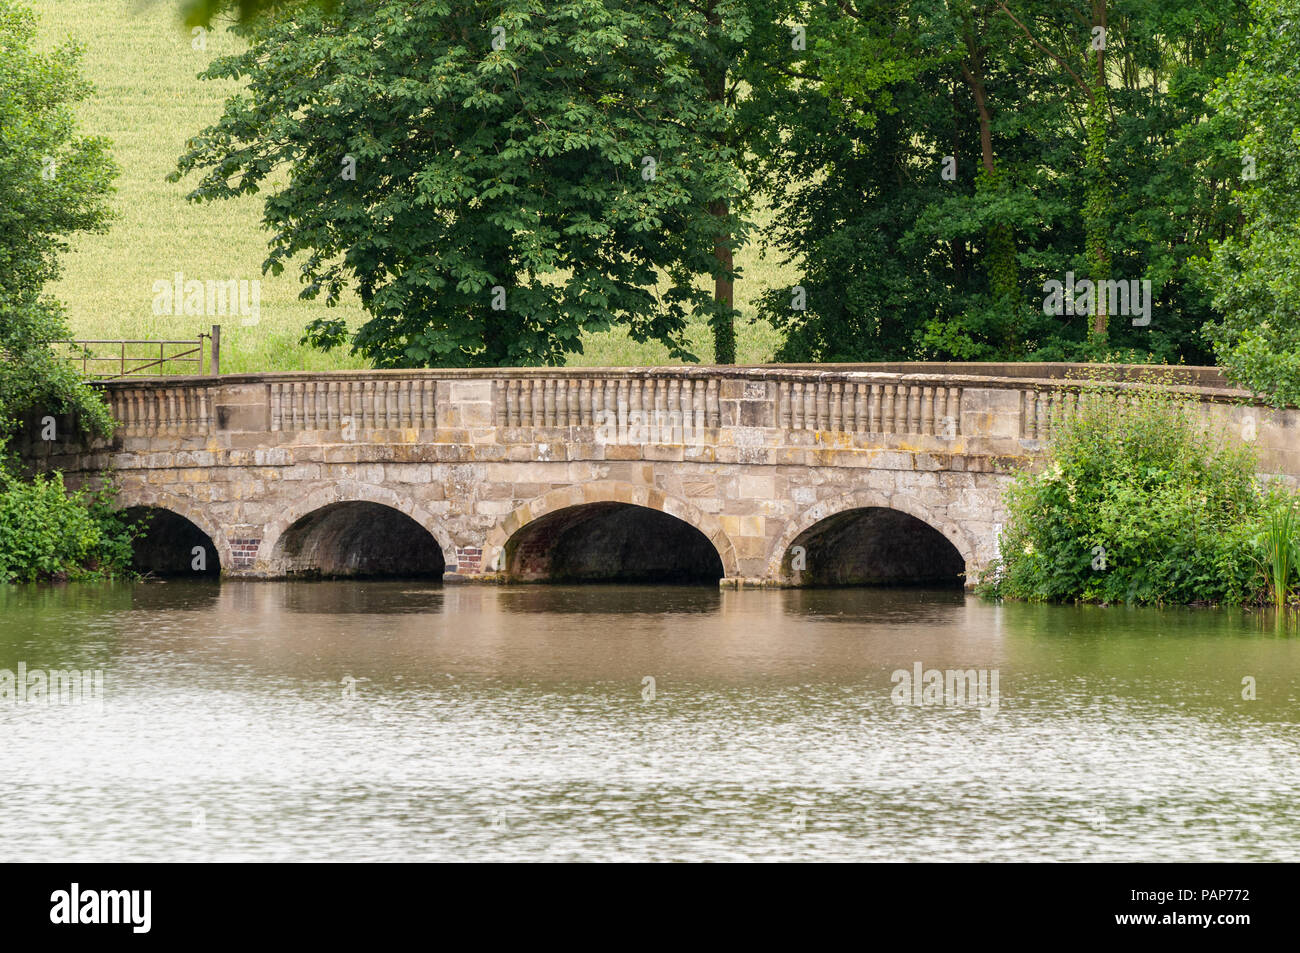 Compton Verney Bridge, Warwickshire - Stock Image